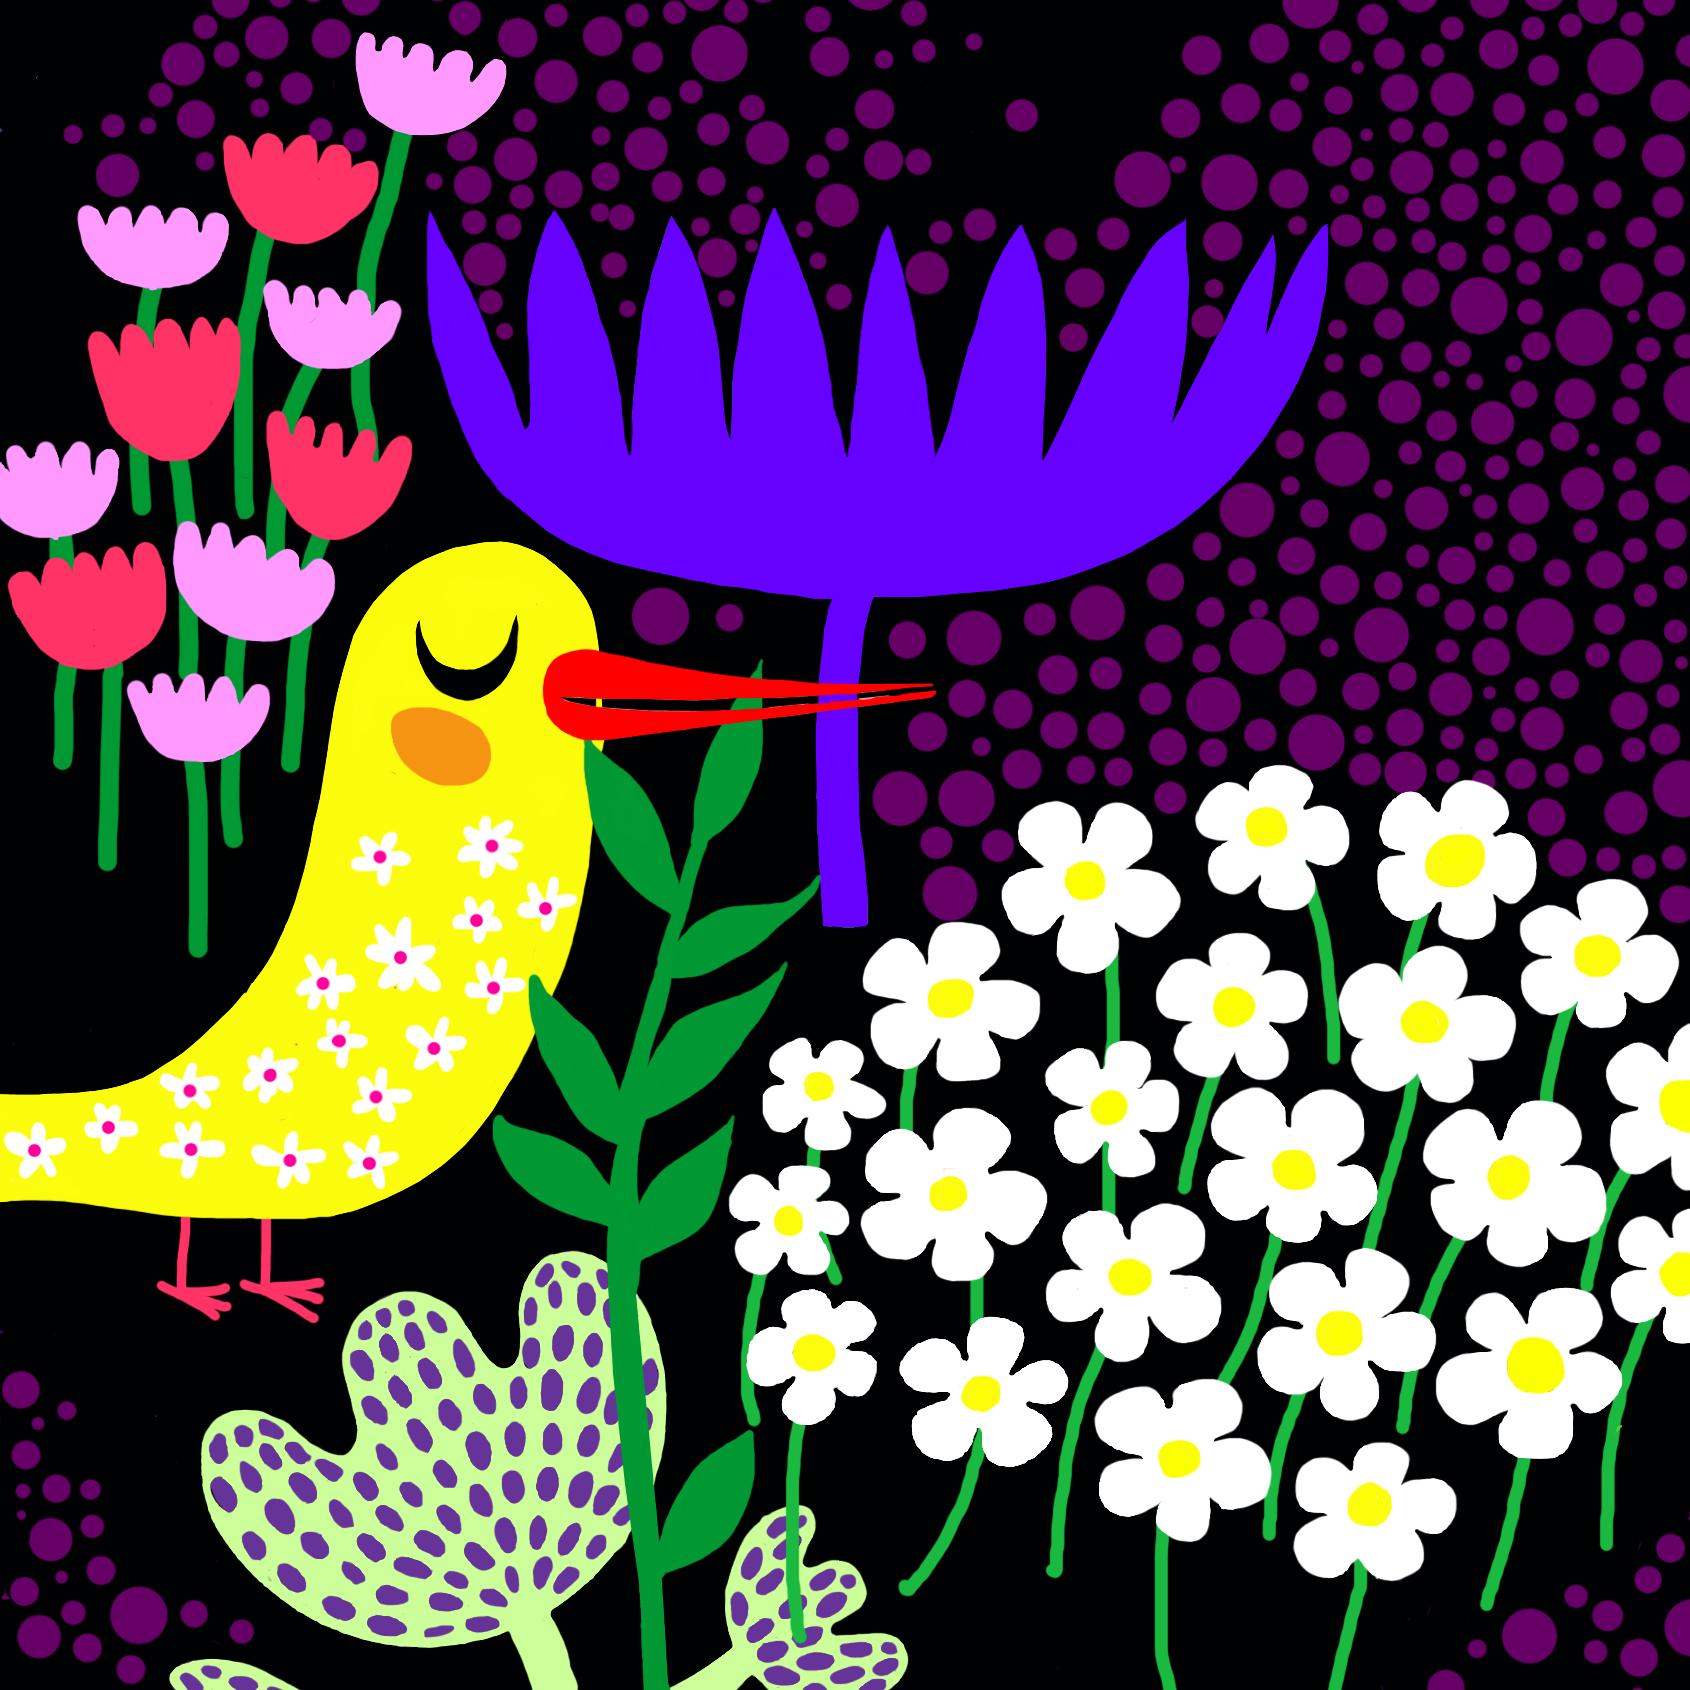 oiseau_carre